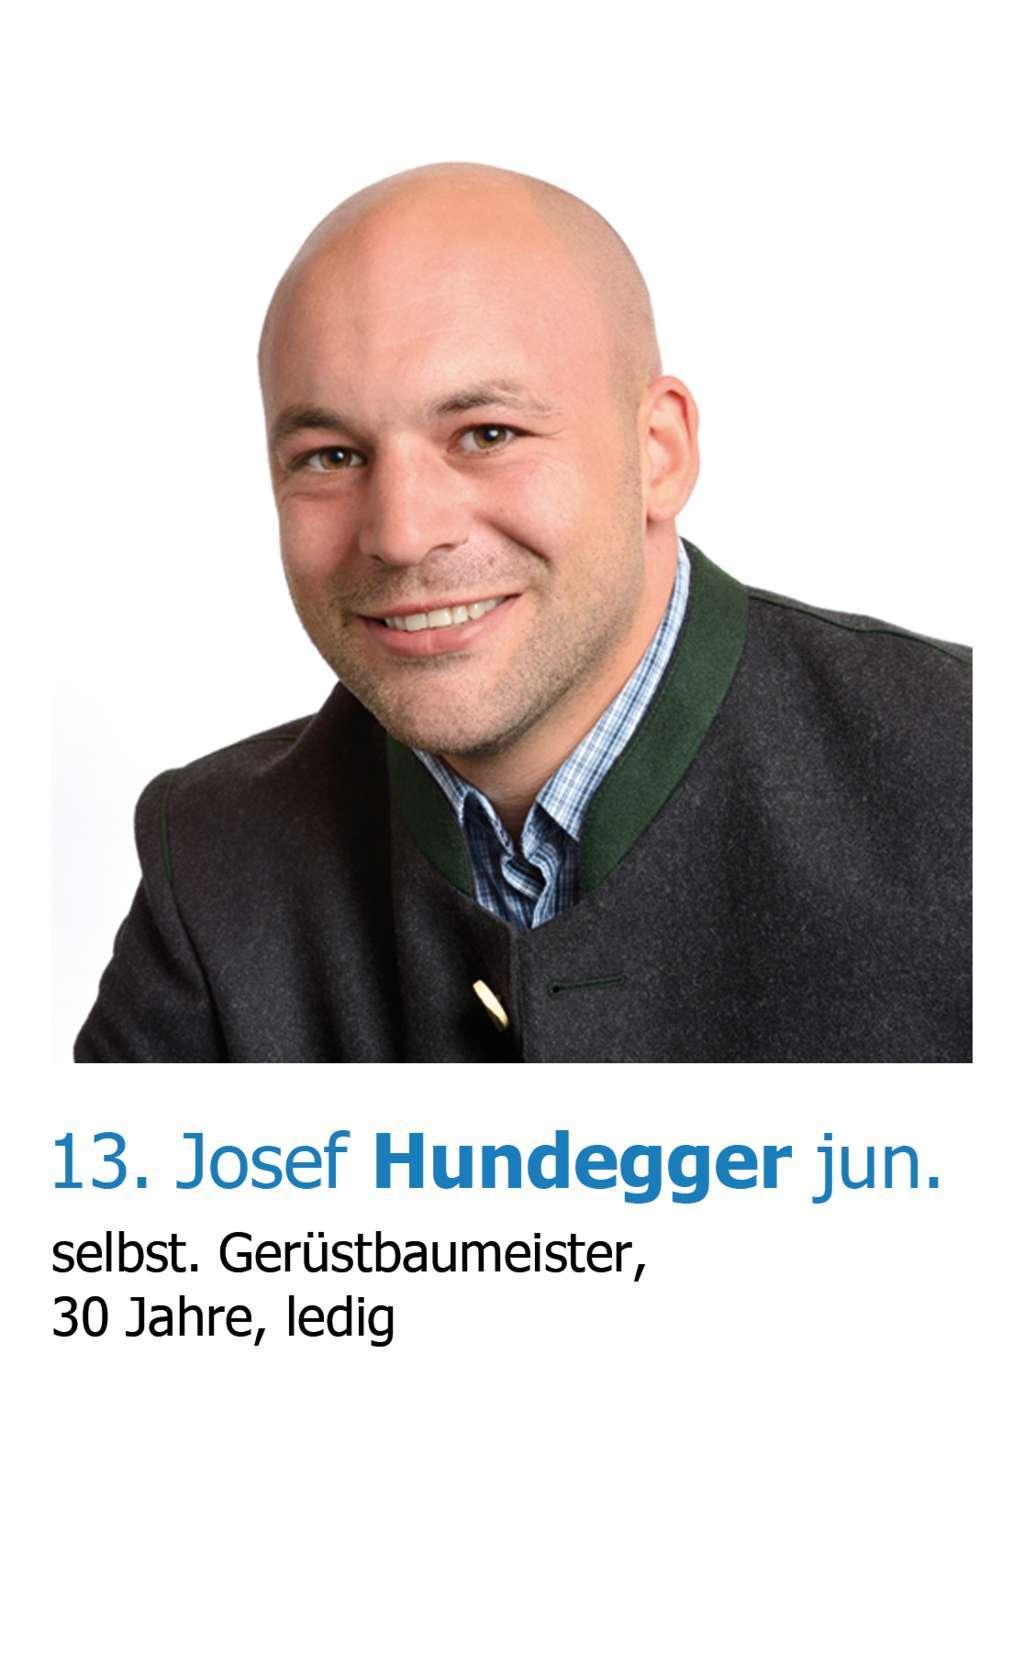 Josef Hundegger jun.